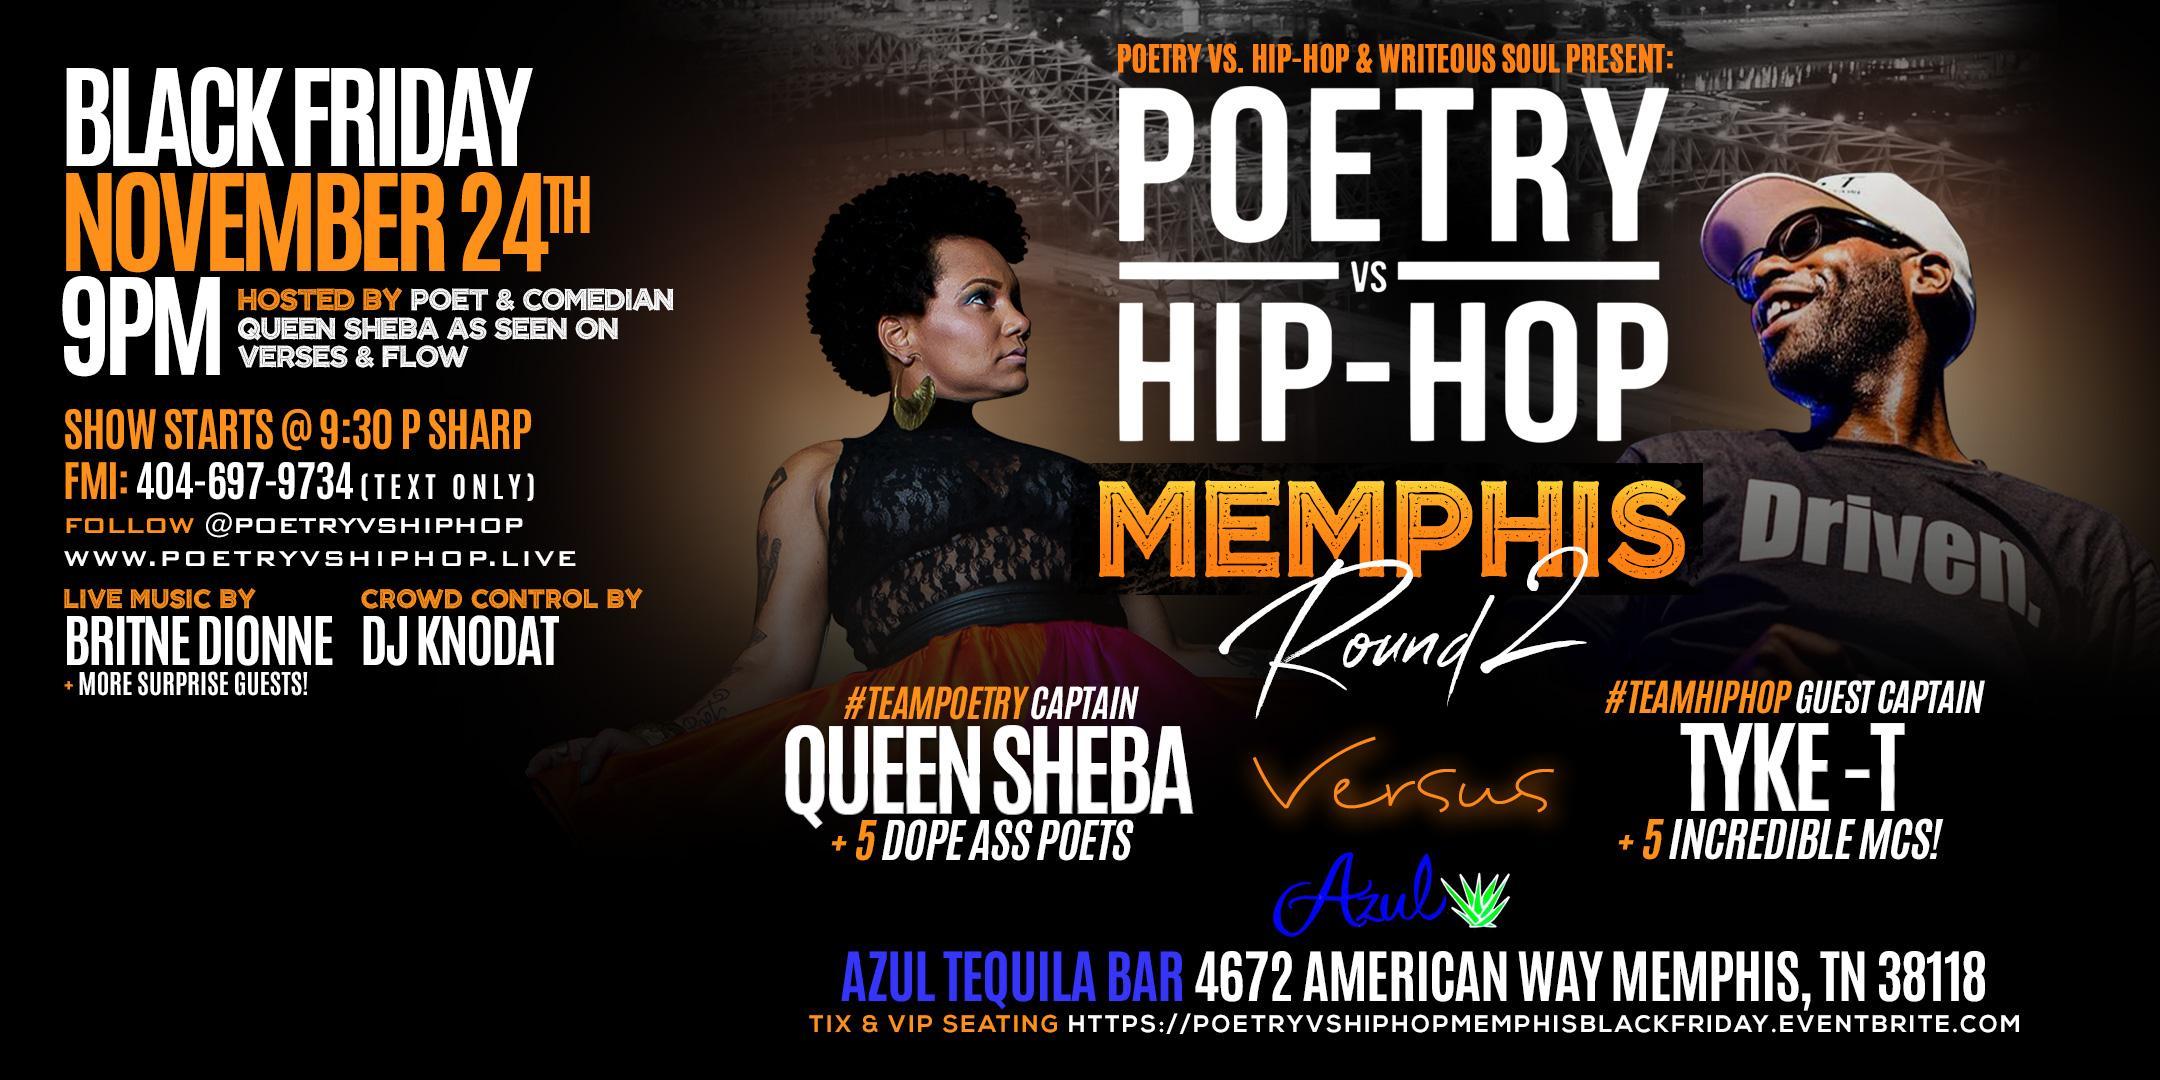 Poetry vs. Hip-Hop Memphis Round II - Featuring Britne Dionne & Tyke T!